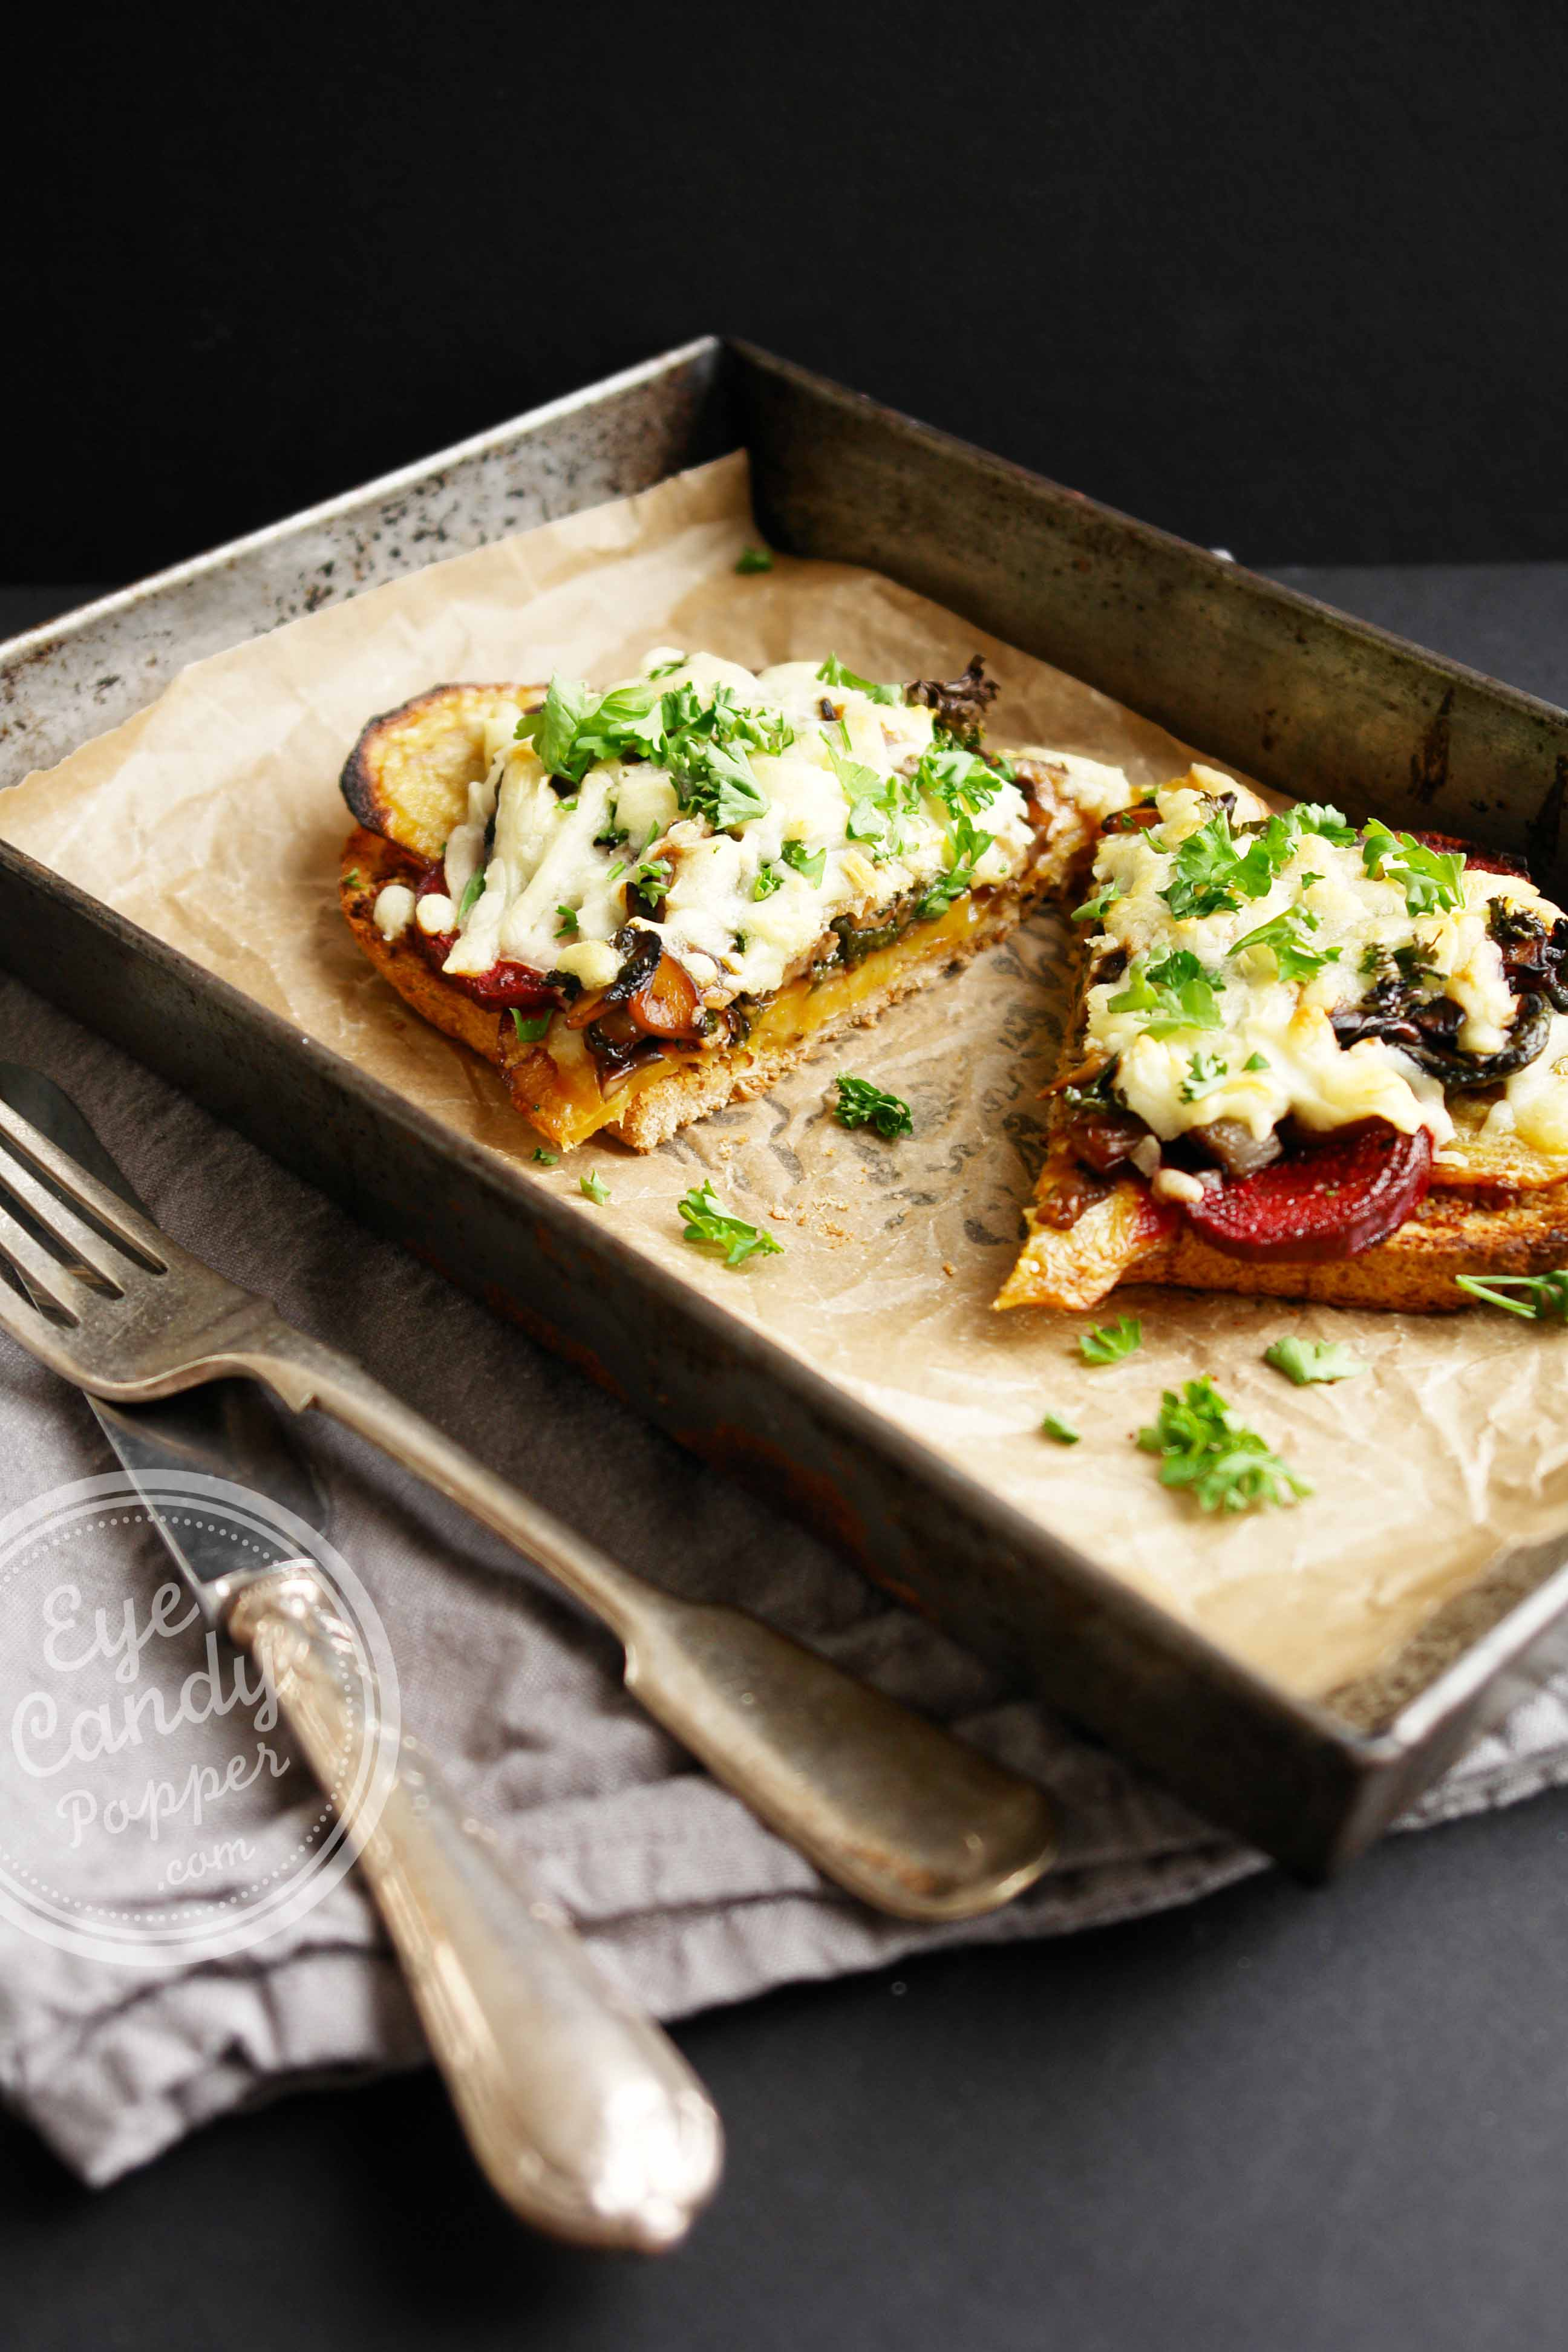 Balsamic Mushroom Toast with grain mustard and roasted beets